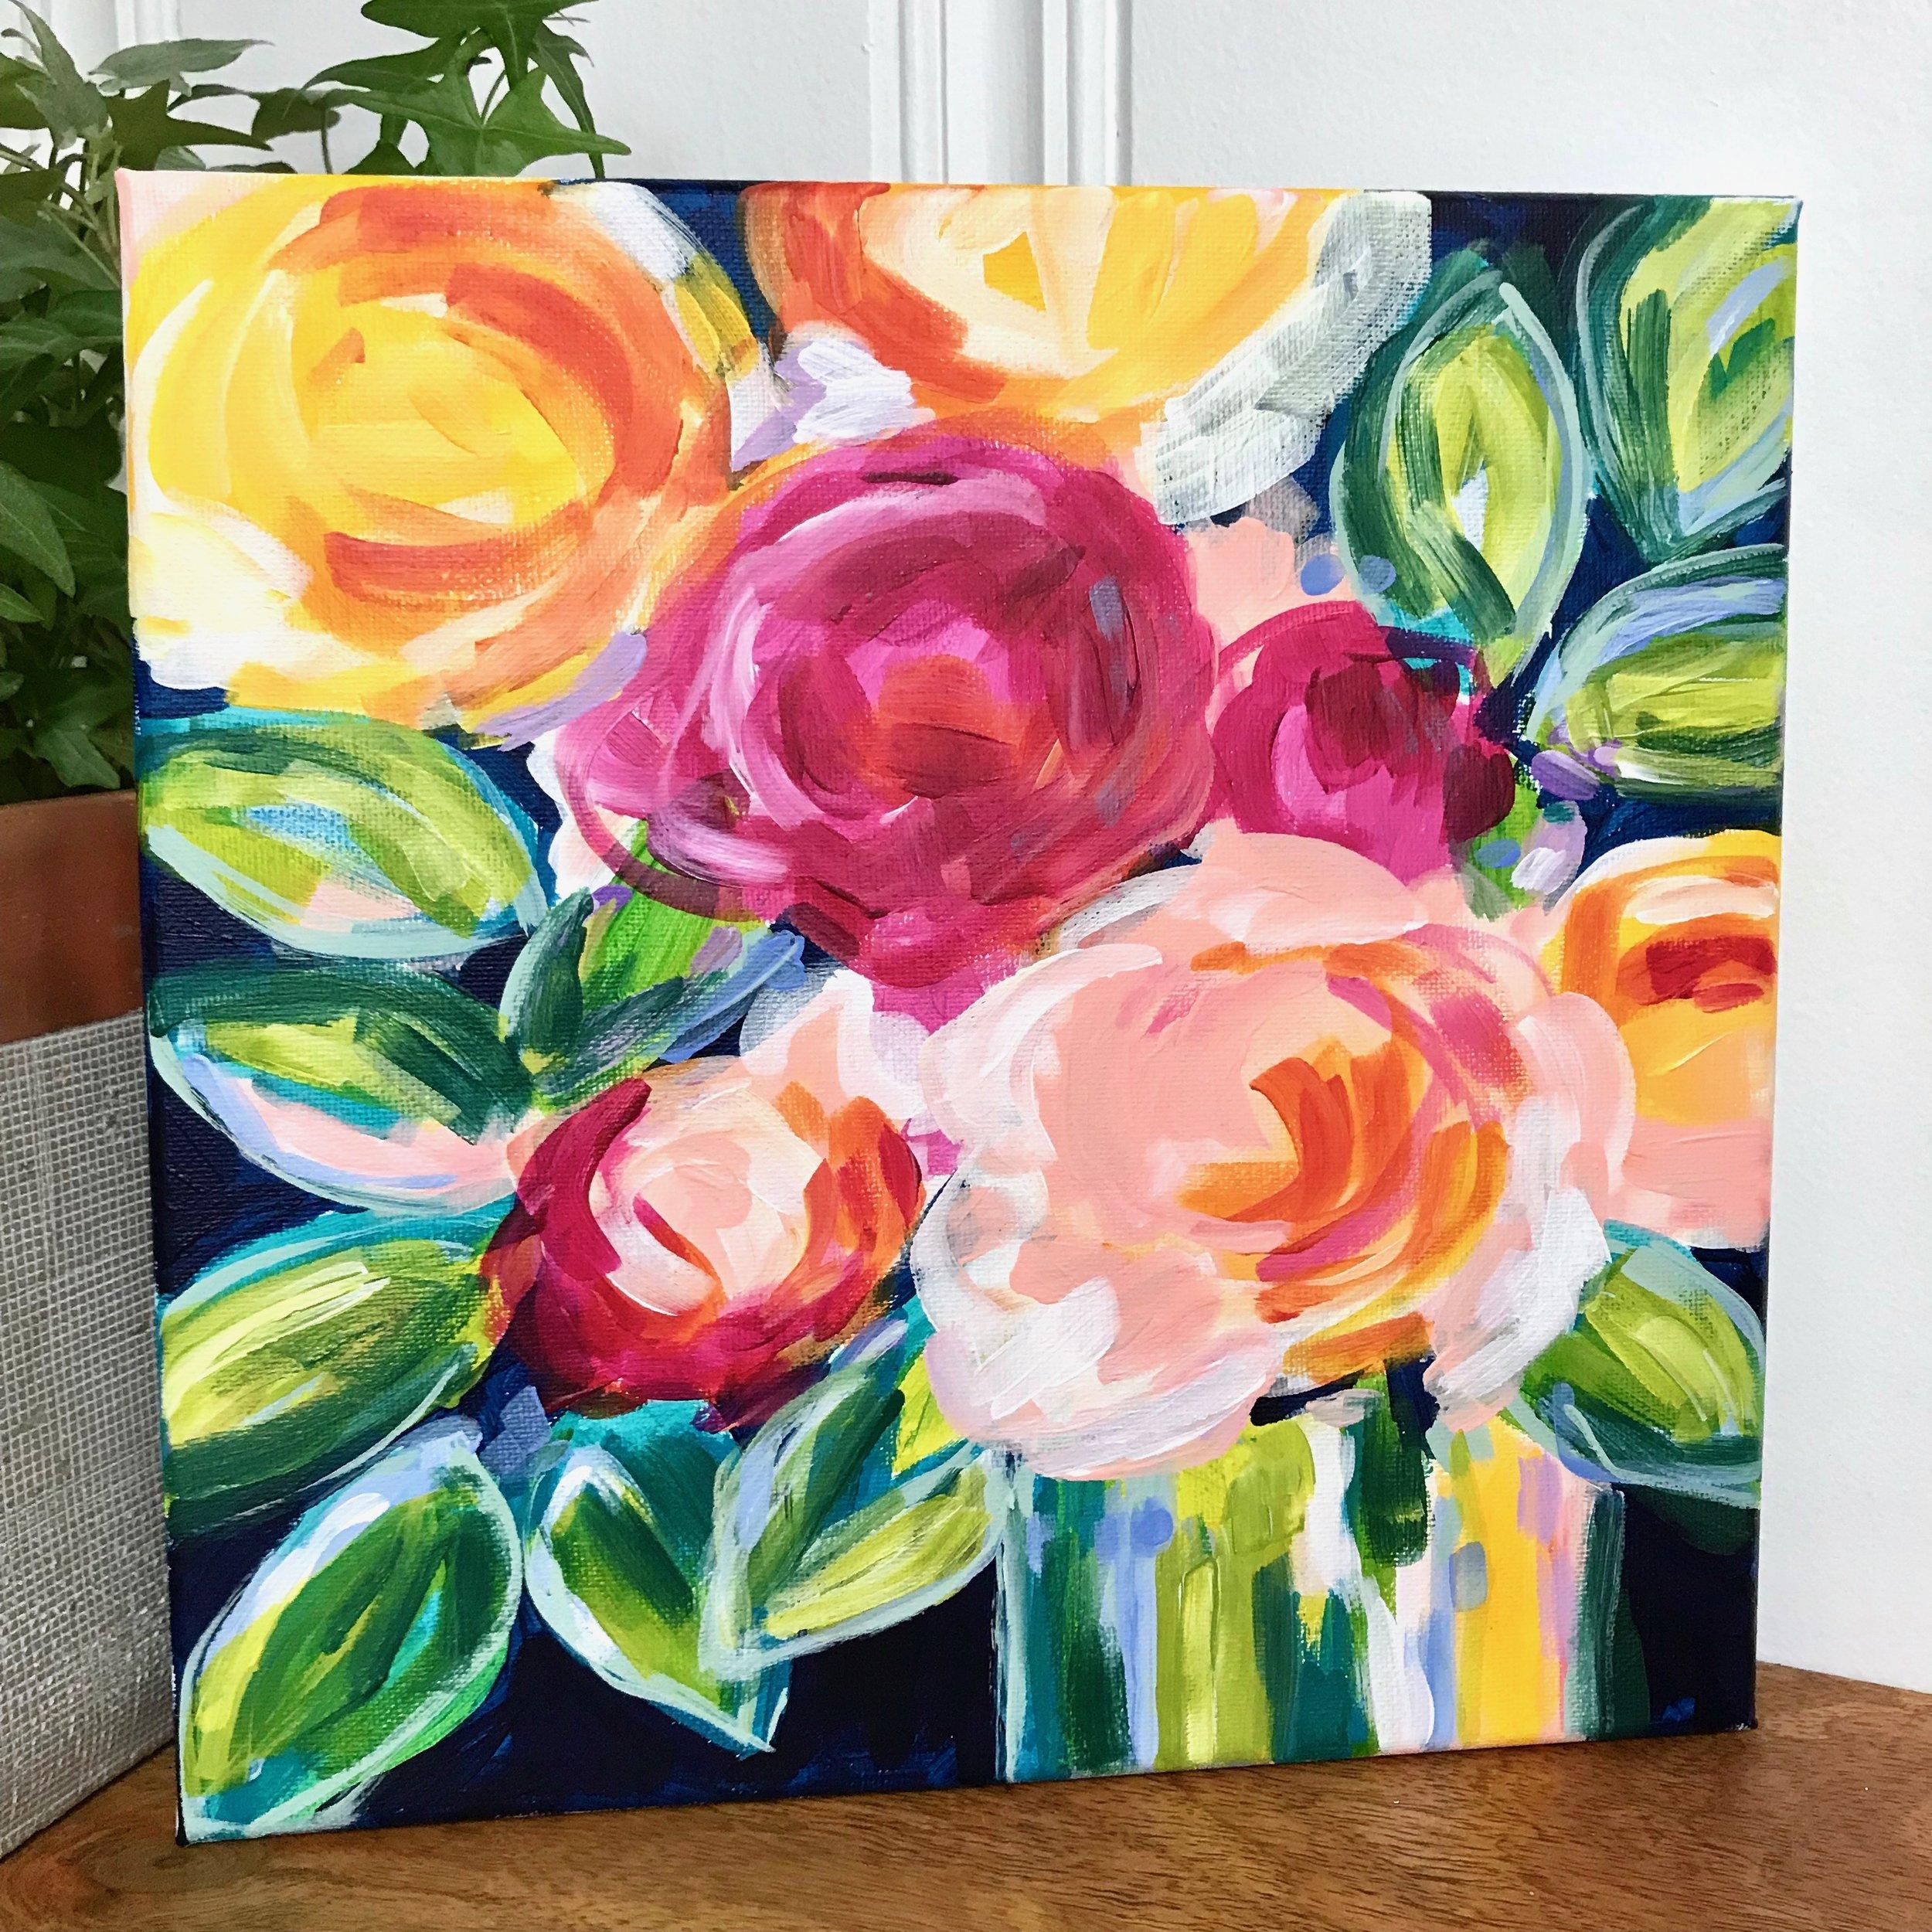 elle byers abstract floral art 0820.JPG